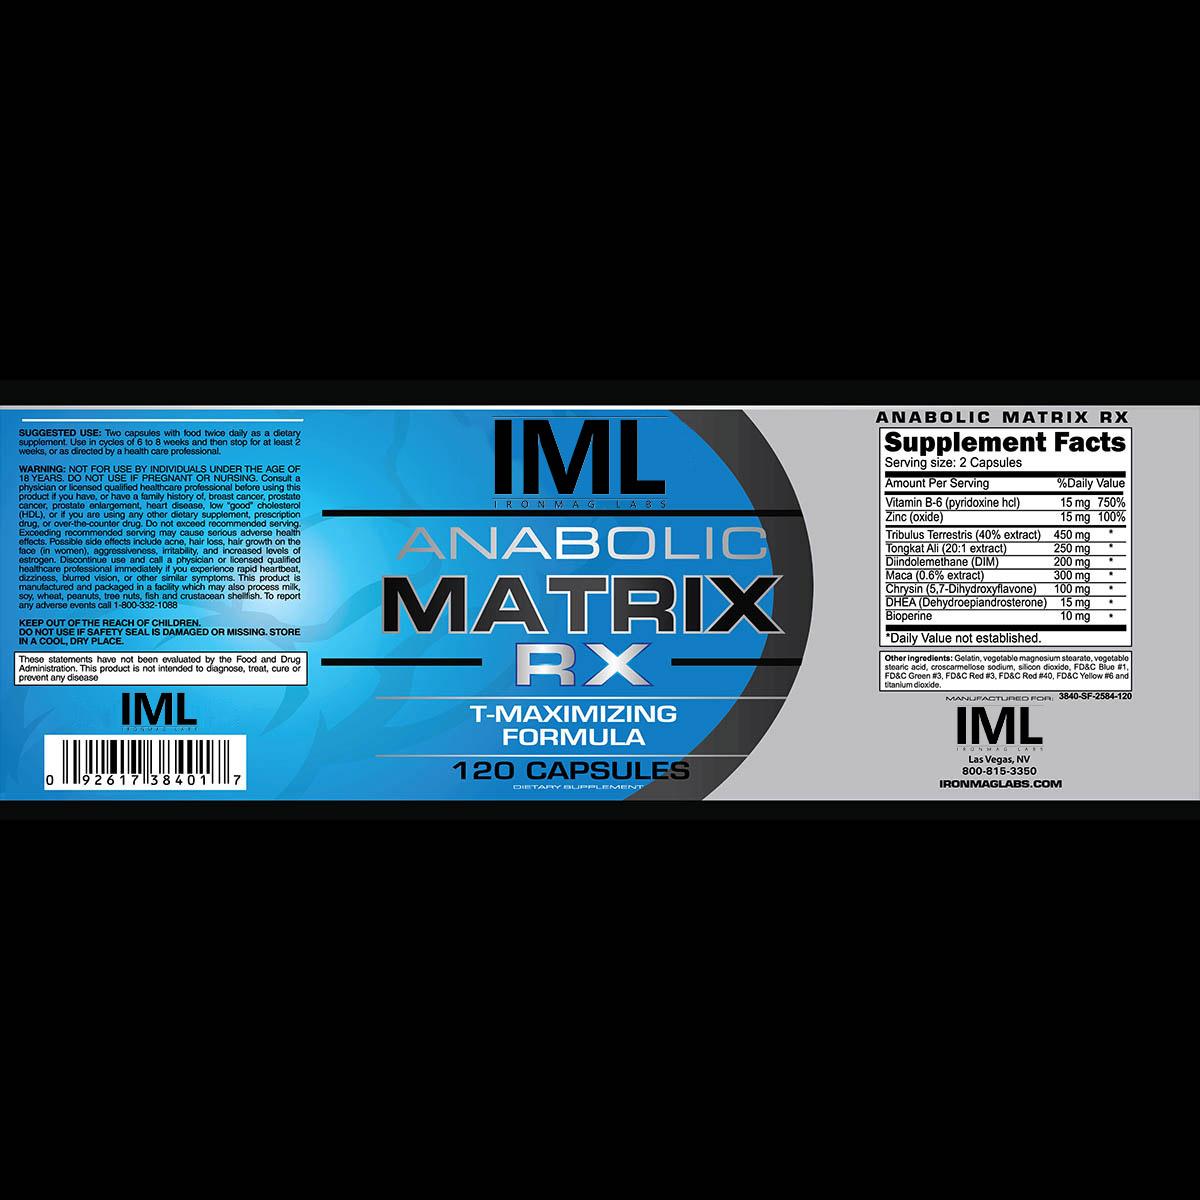 anabolic matrix rx testosterone booster